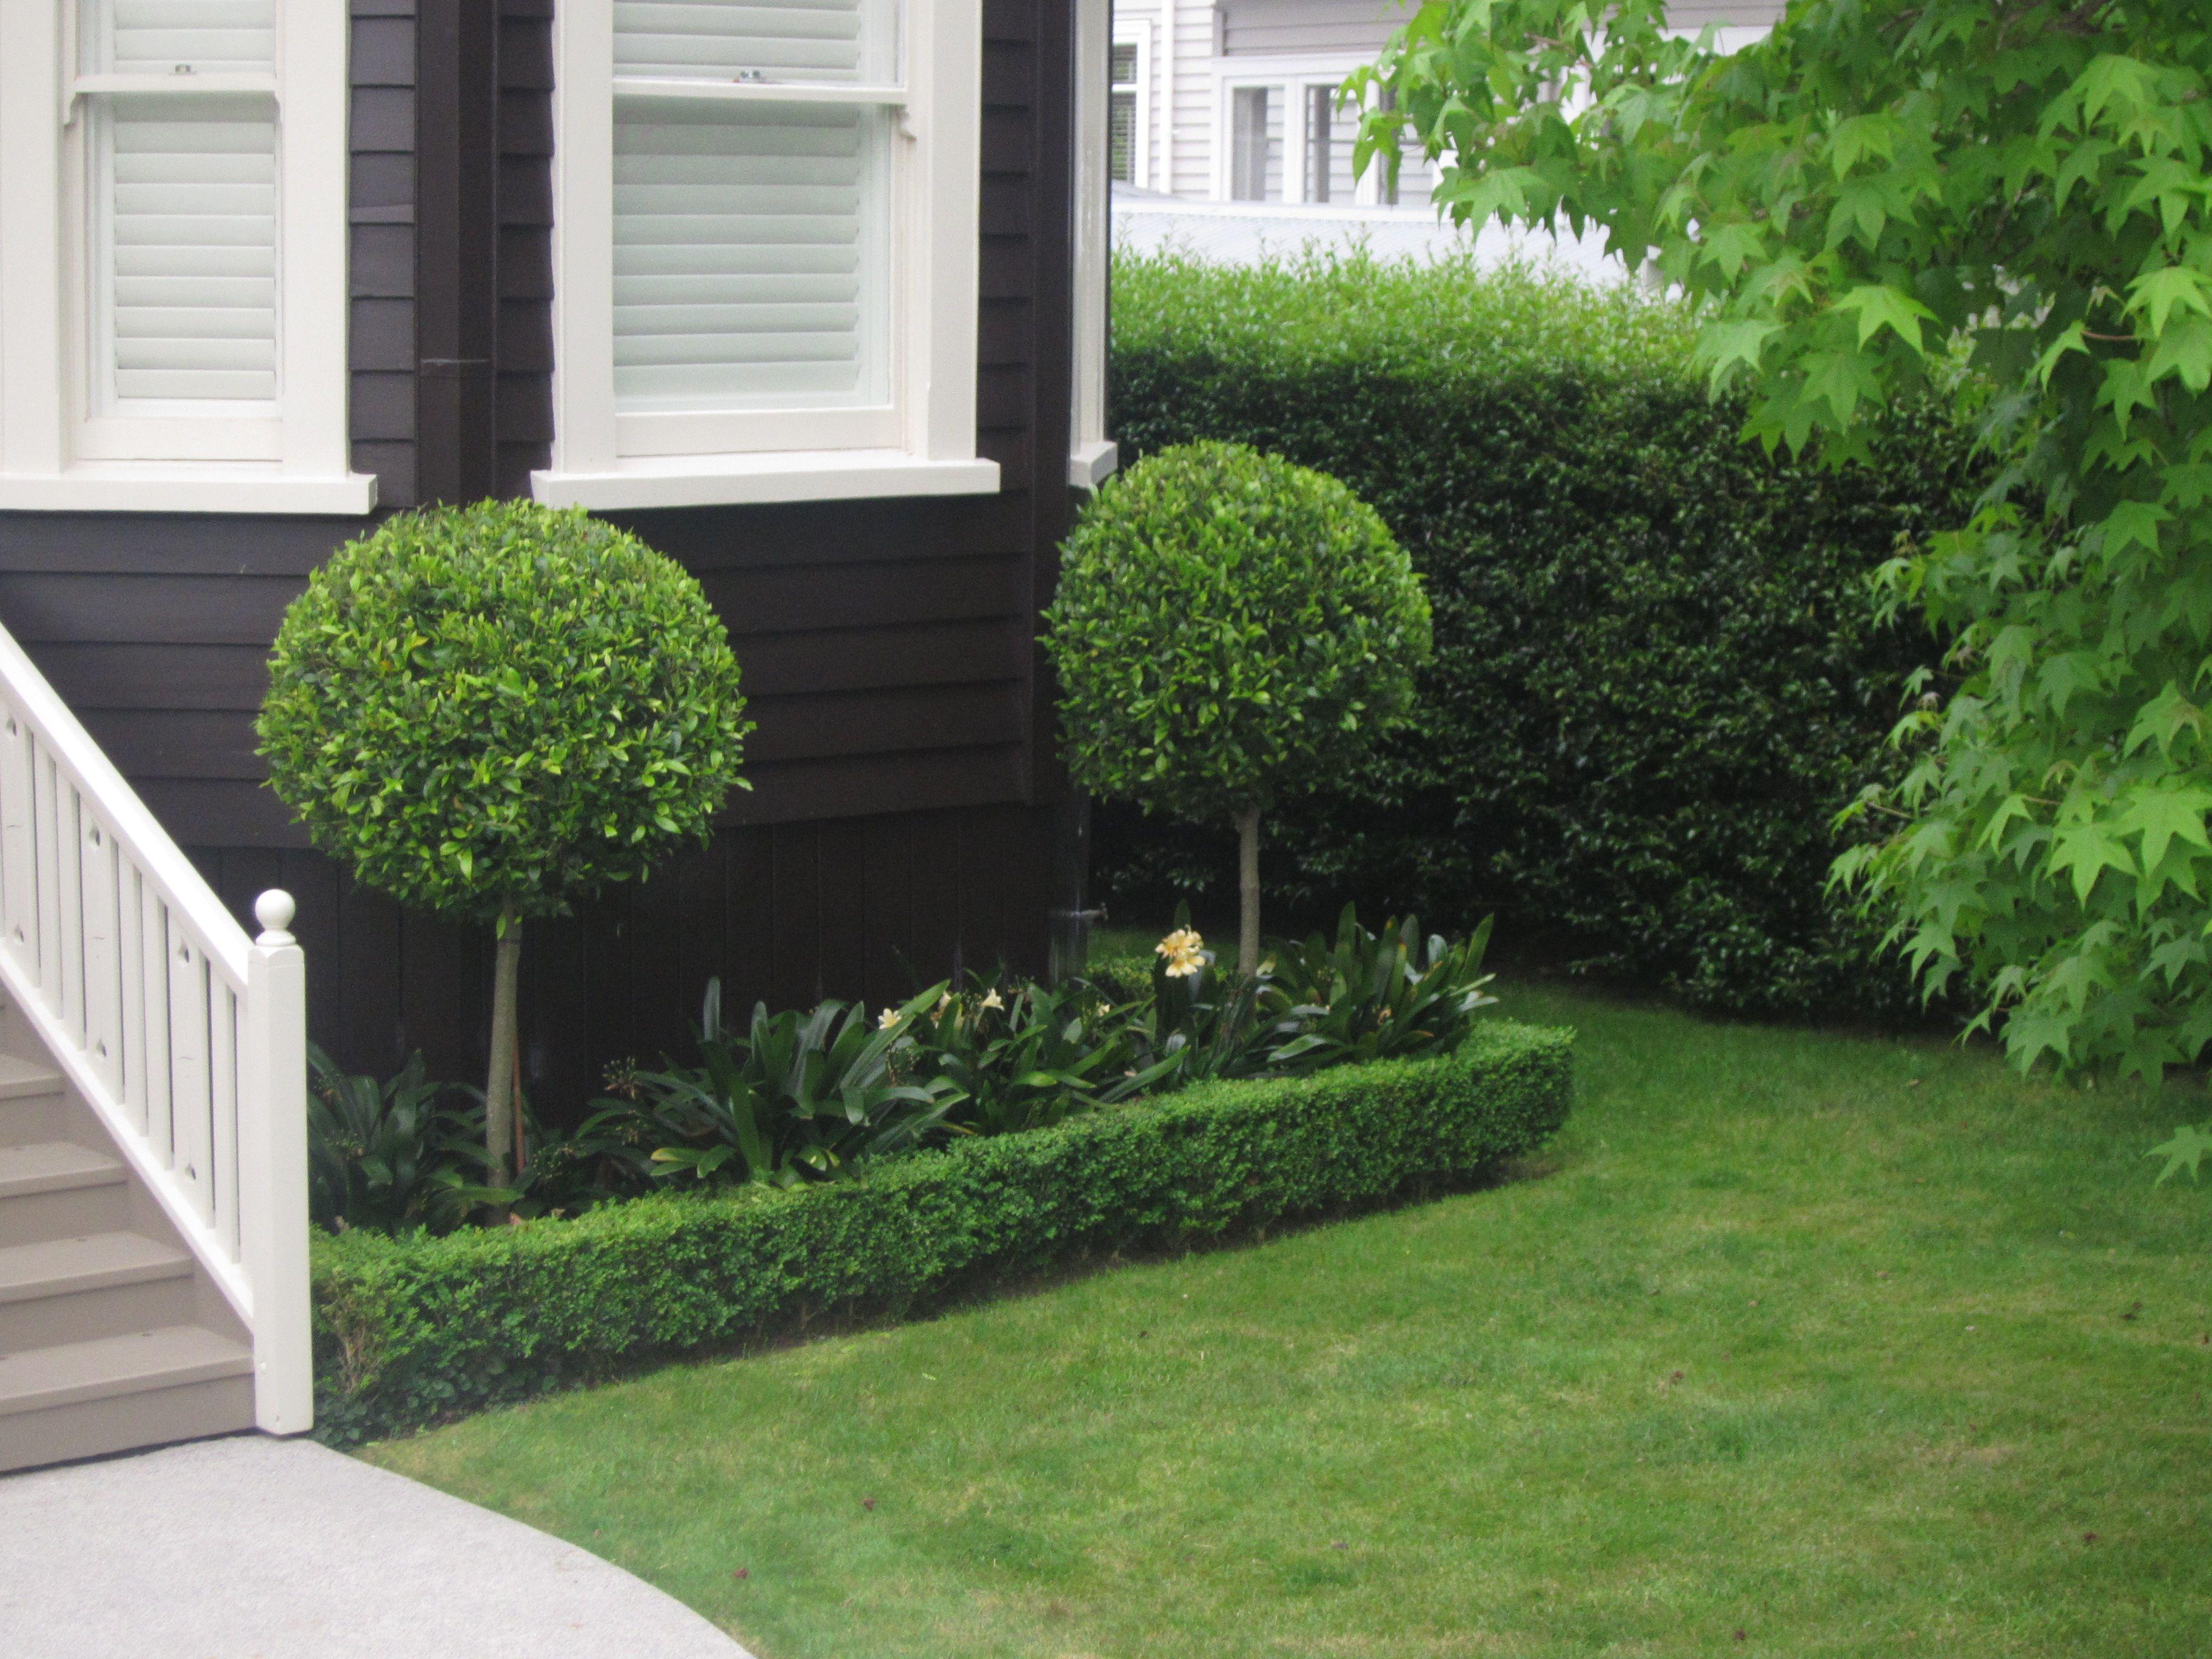 Topiary Garden Design Ideas Part - 30: Small Gardens · I Do Like Laurel Topiary Balls - Along The Entrance Path?